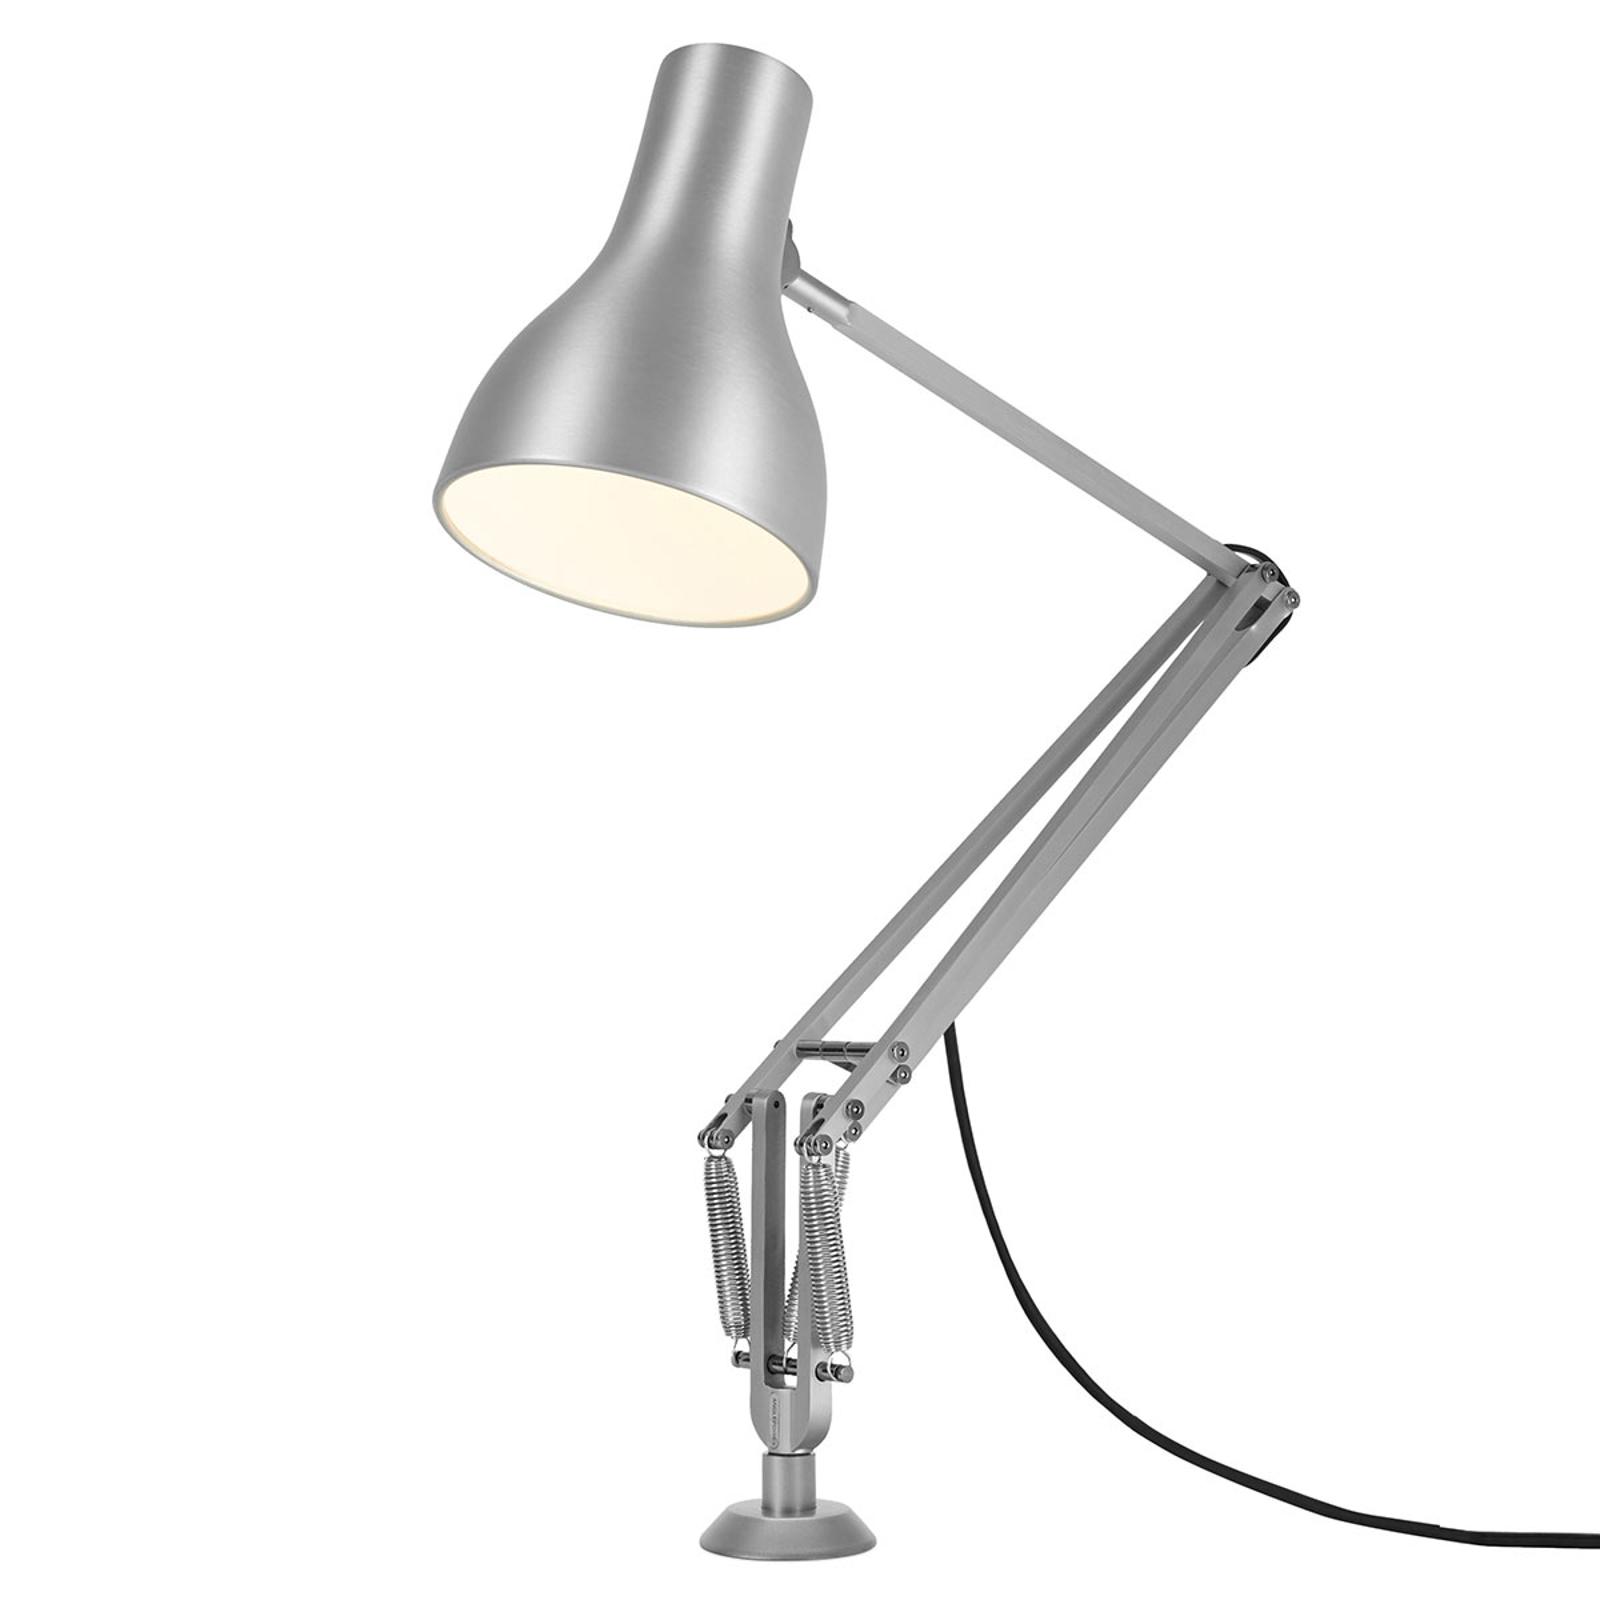 Anglepoise Type 75 Tischlampe Schraubfuß silber